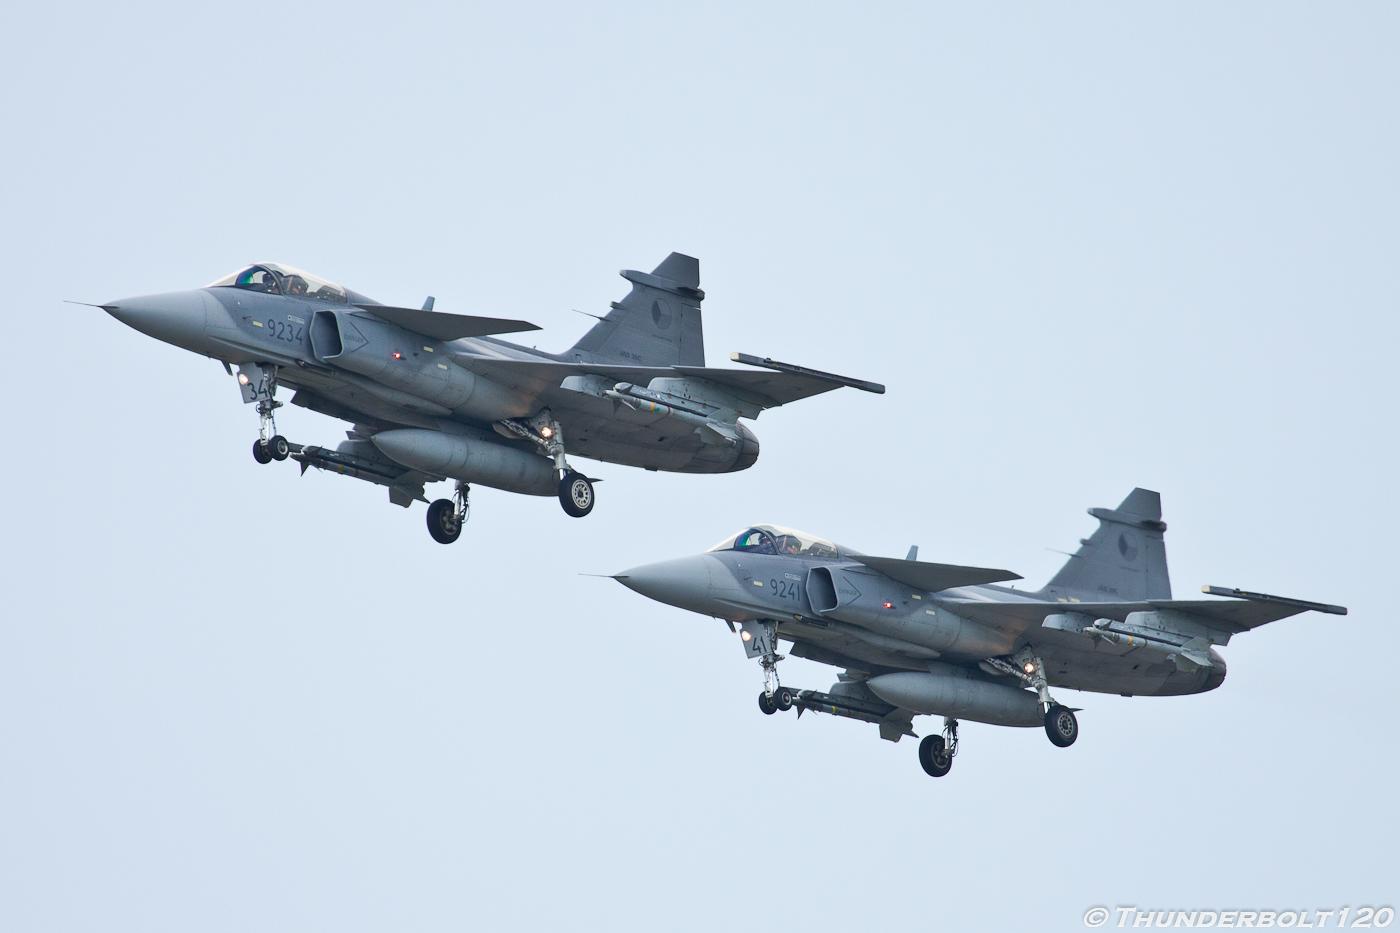 2x JAS-39C Gripen